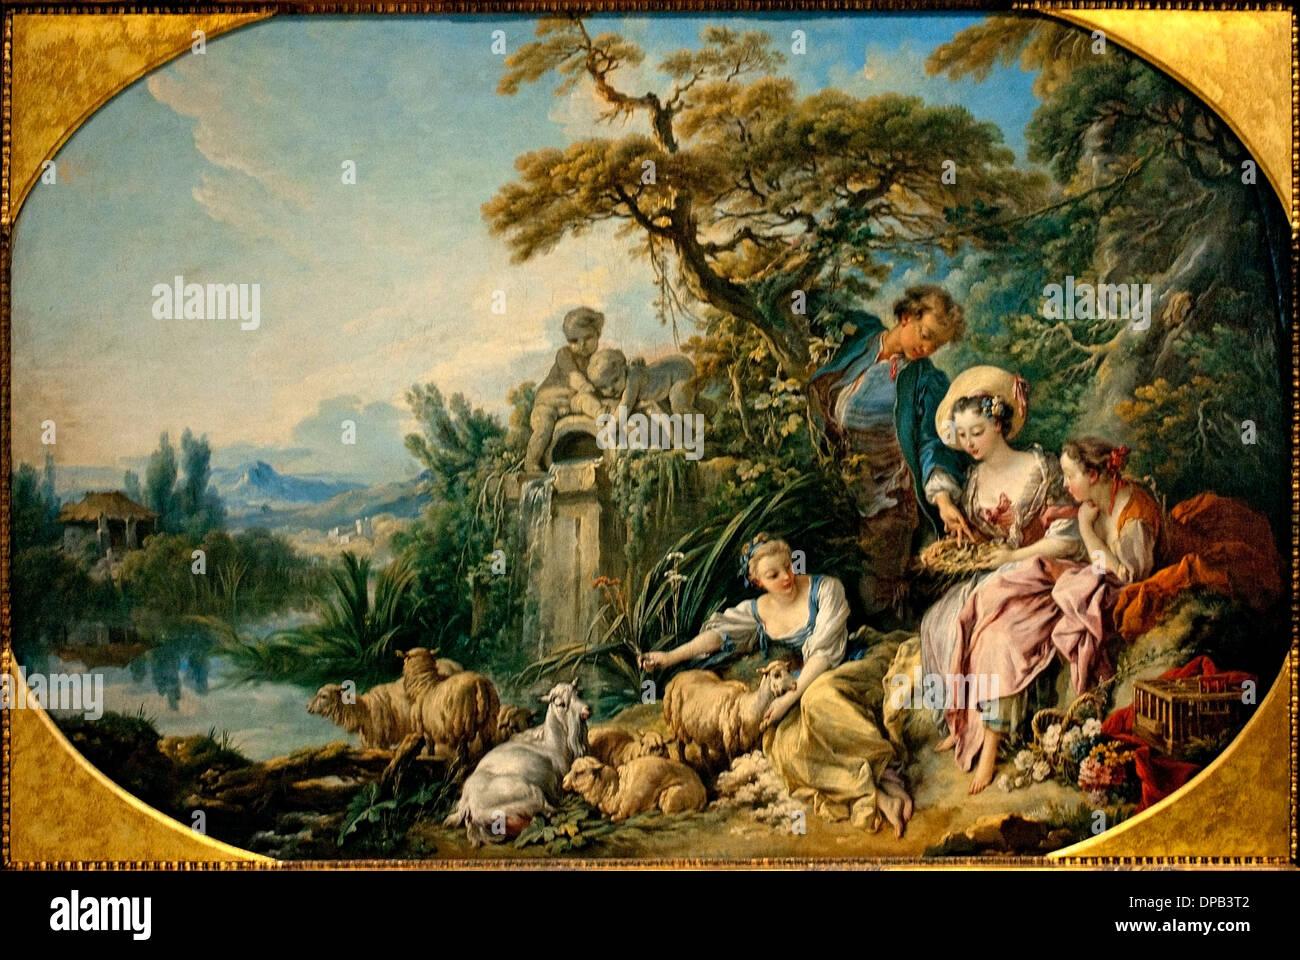 Anidar también dijeron presente Pastor 1740 François Boucher, 1703 - 1770 Francia Imagen De Stock